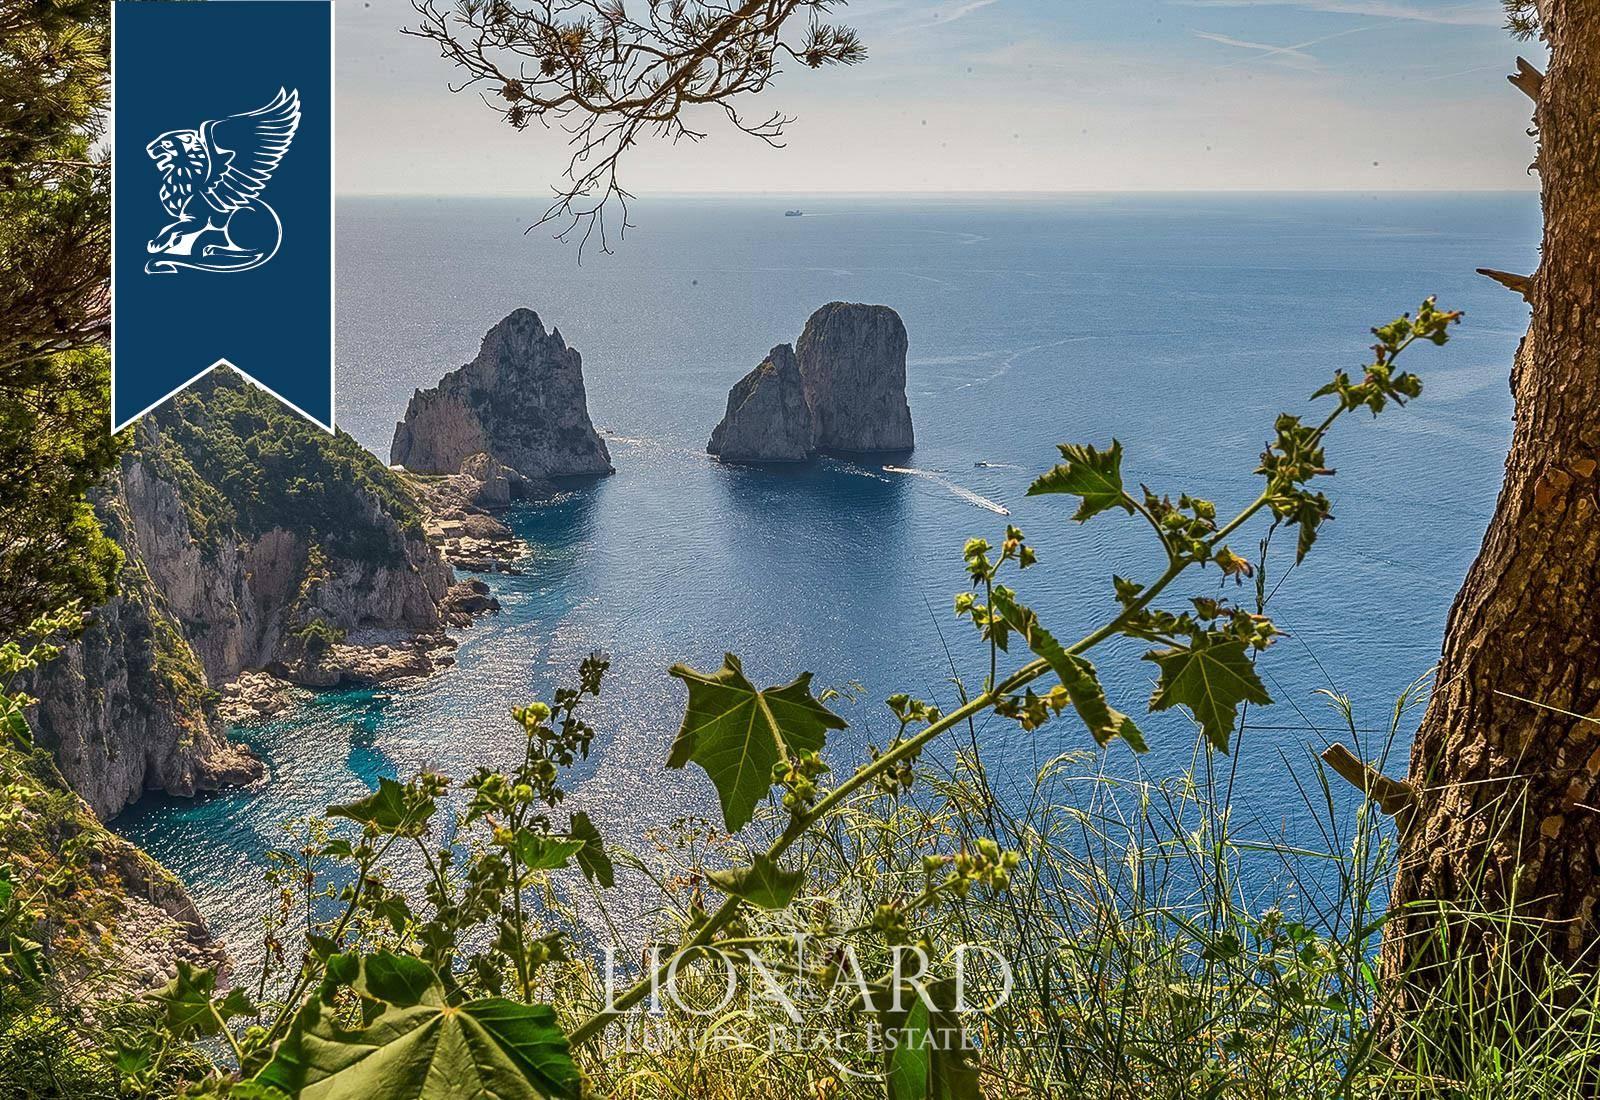 Albergo in Vendita a Capri: 0 locali, 1500 mq - Foto 2